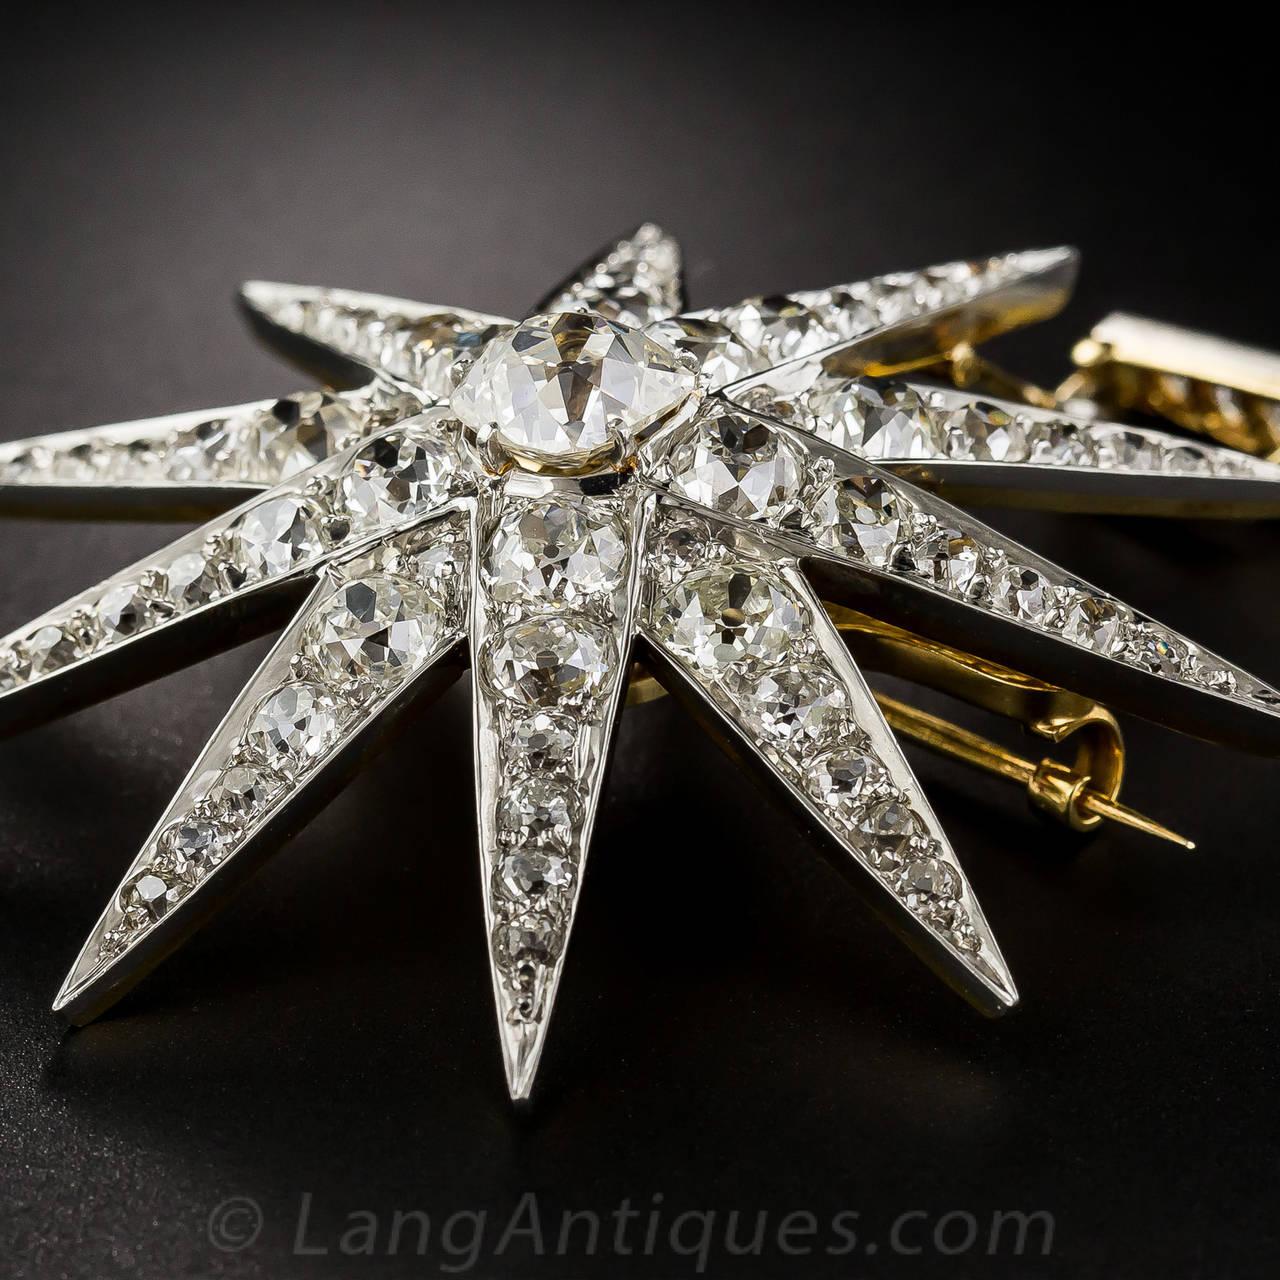 Victorian 2.13 Carat Cushion Cut Diamond Platinum Star Brooch Pendant - GIA Cert For Sale 3